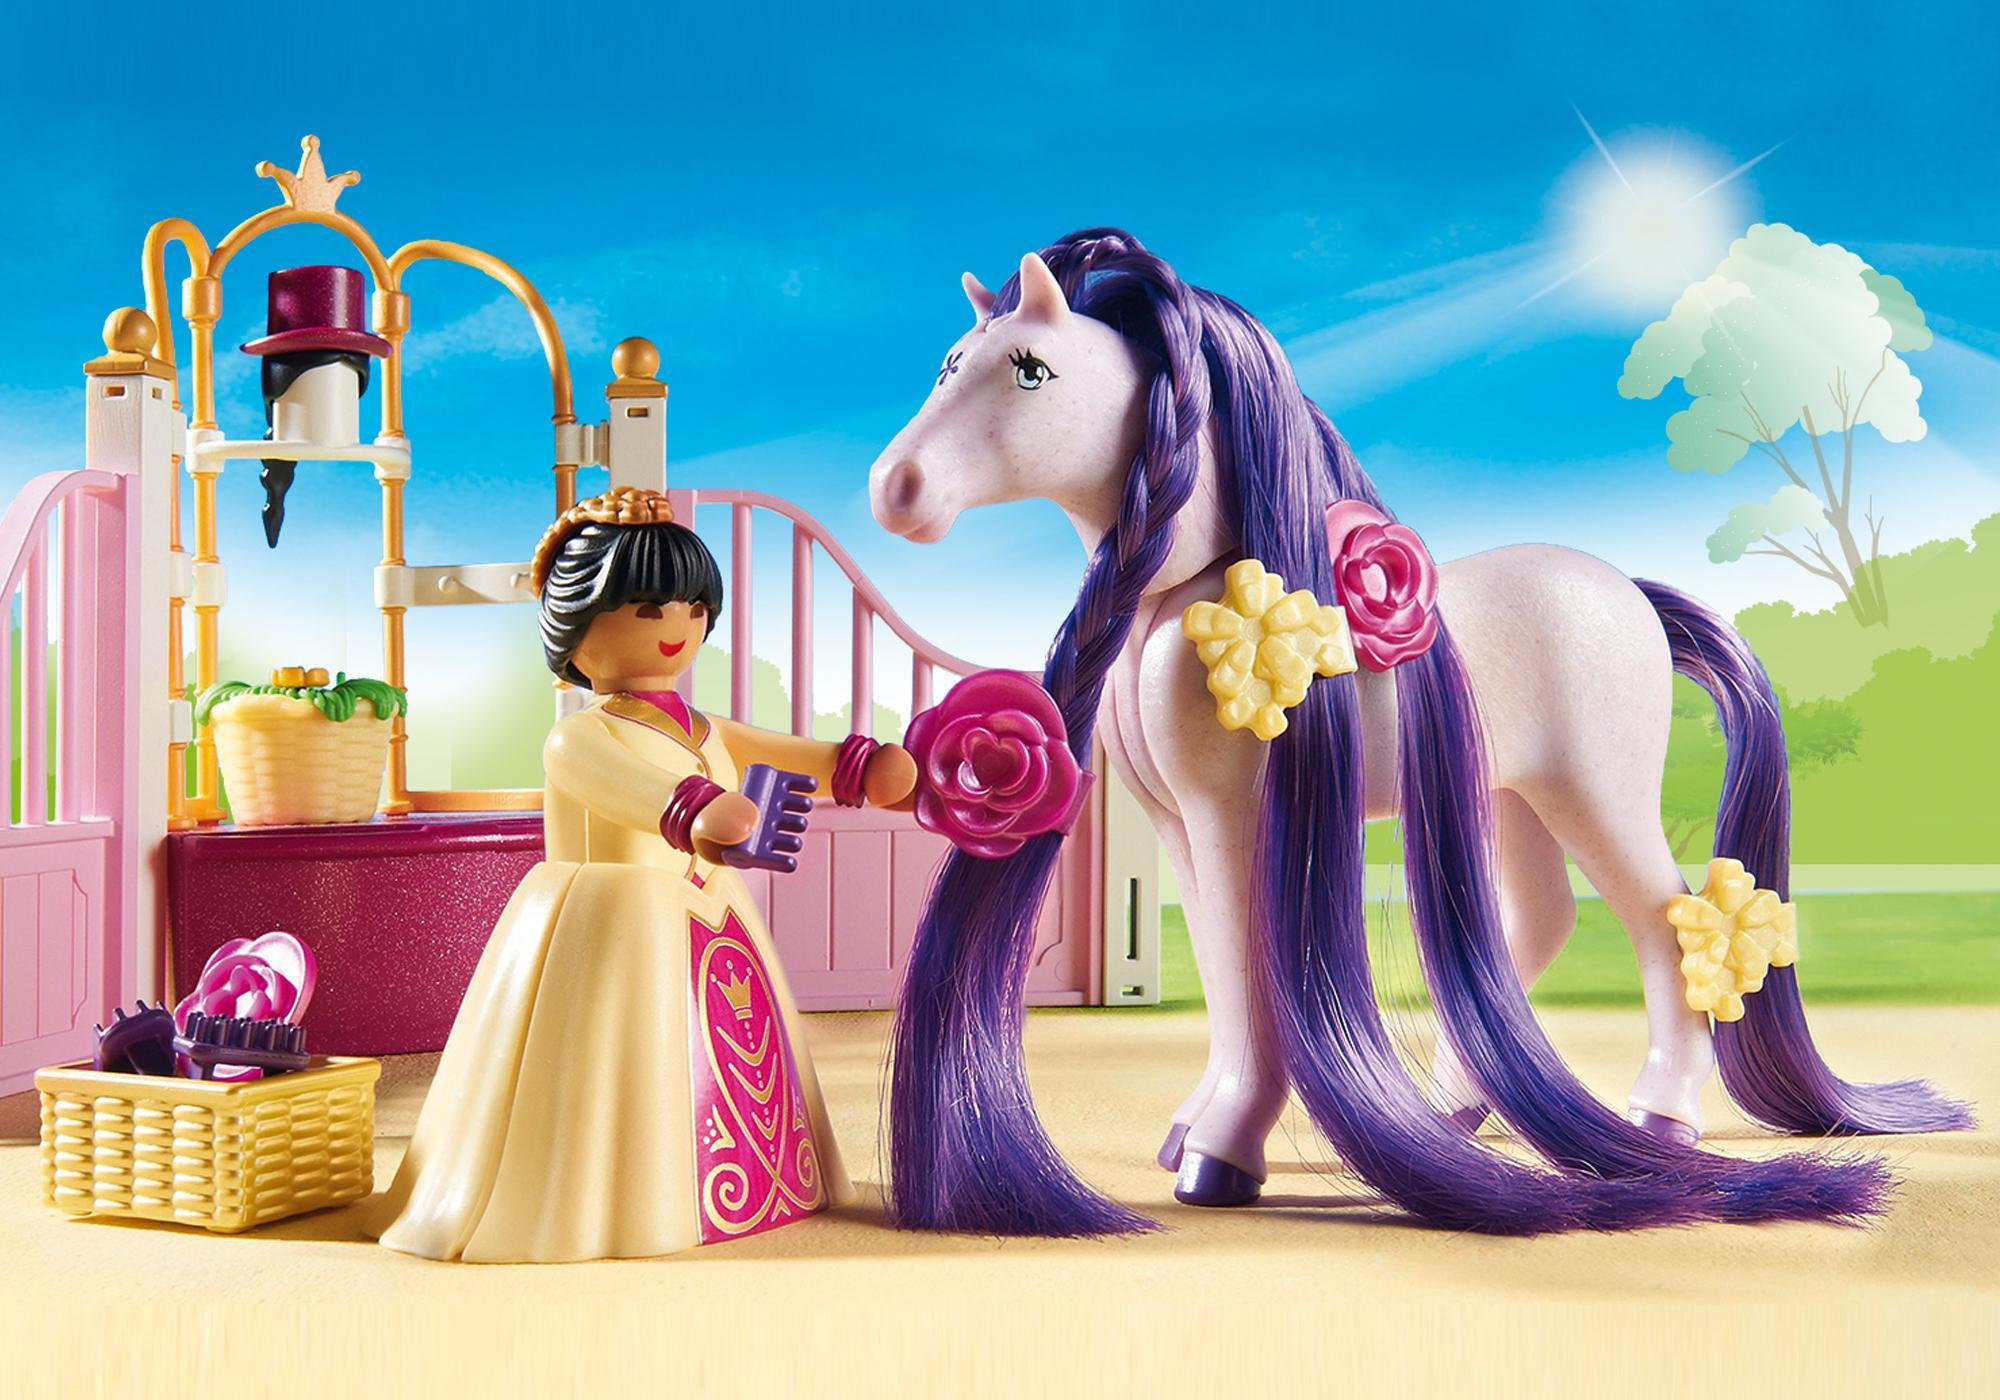 http://media.playmobil.com/i/playmobil/6855_product_extra2/Замок Принцессы: Королевская конюшня